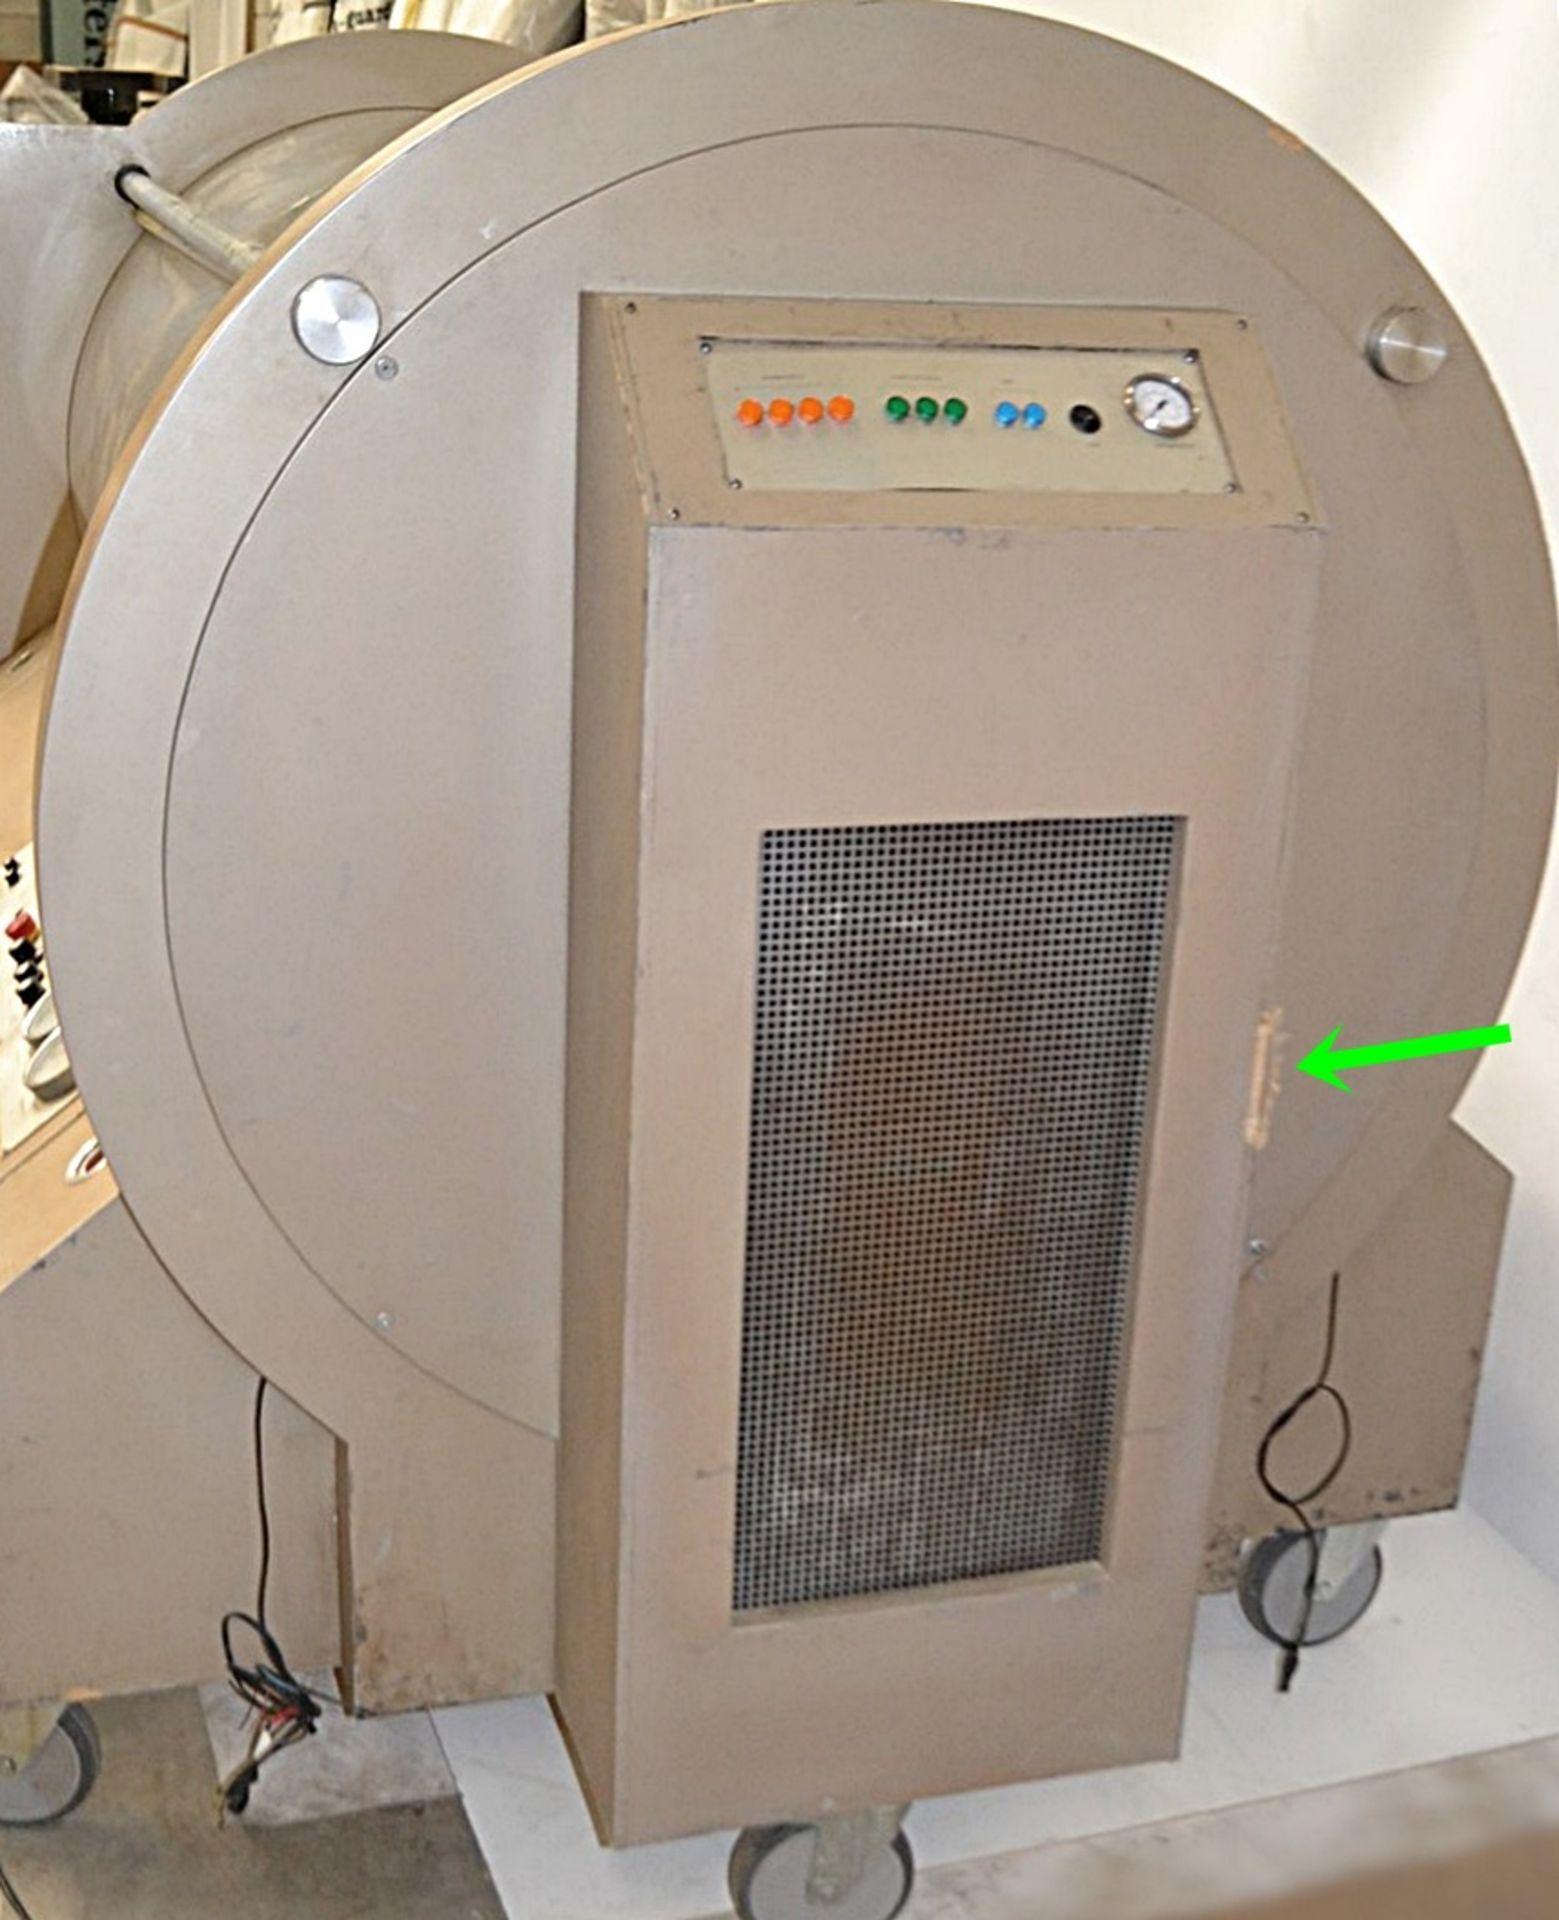 Lot 4551 - 1 x Lifesize Hyperbaric Oxygen Chamber Movie Prop - Dimensions: W250 x H150 x D140cm